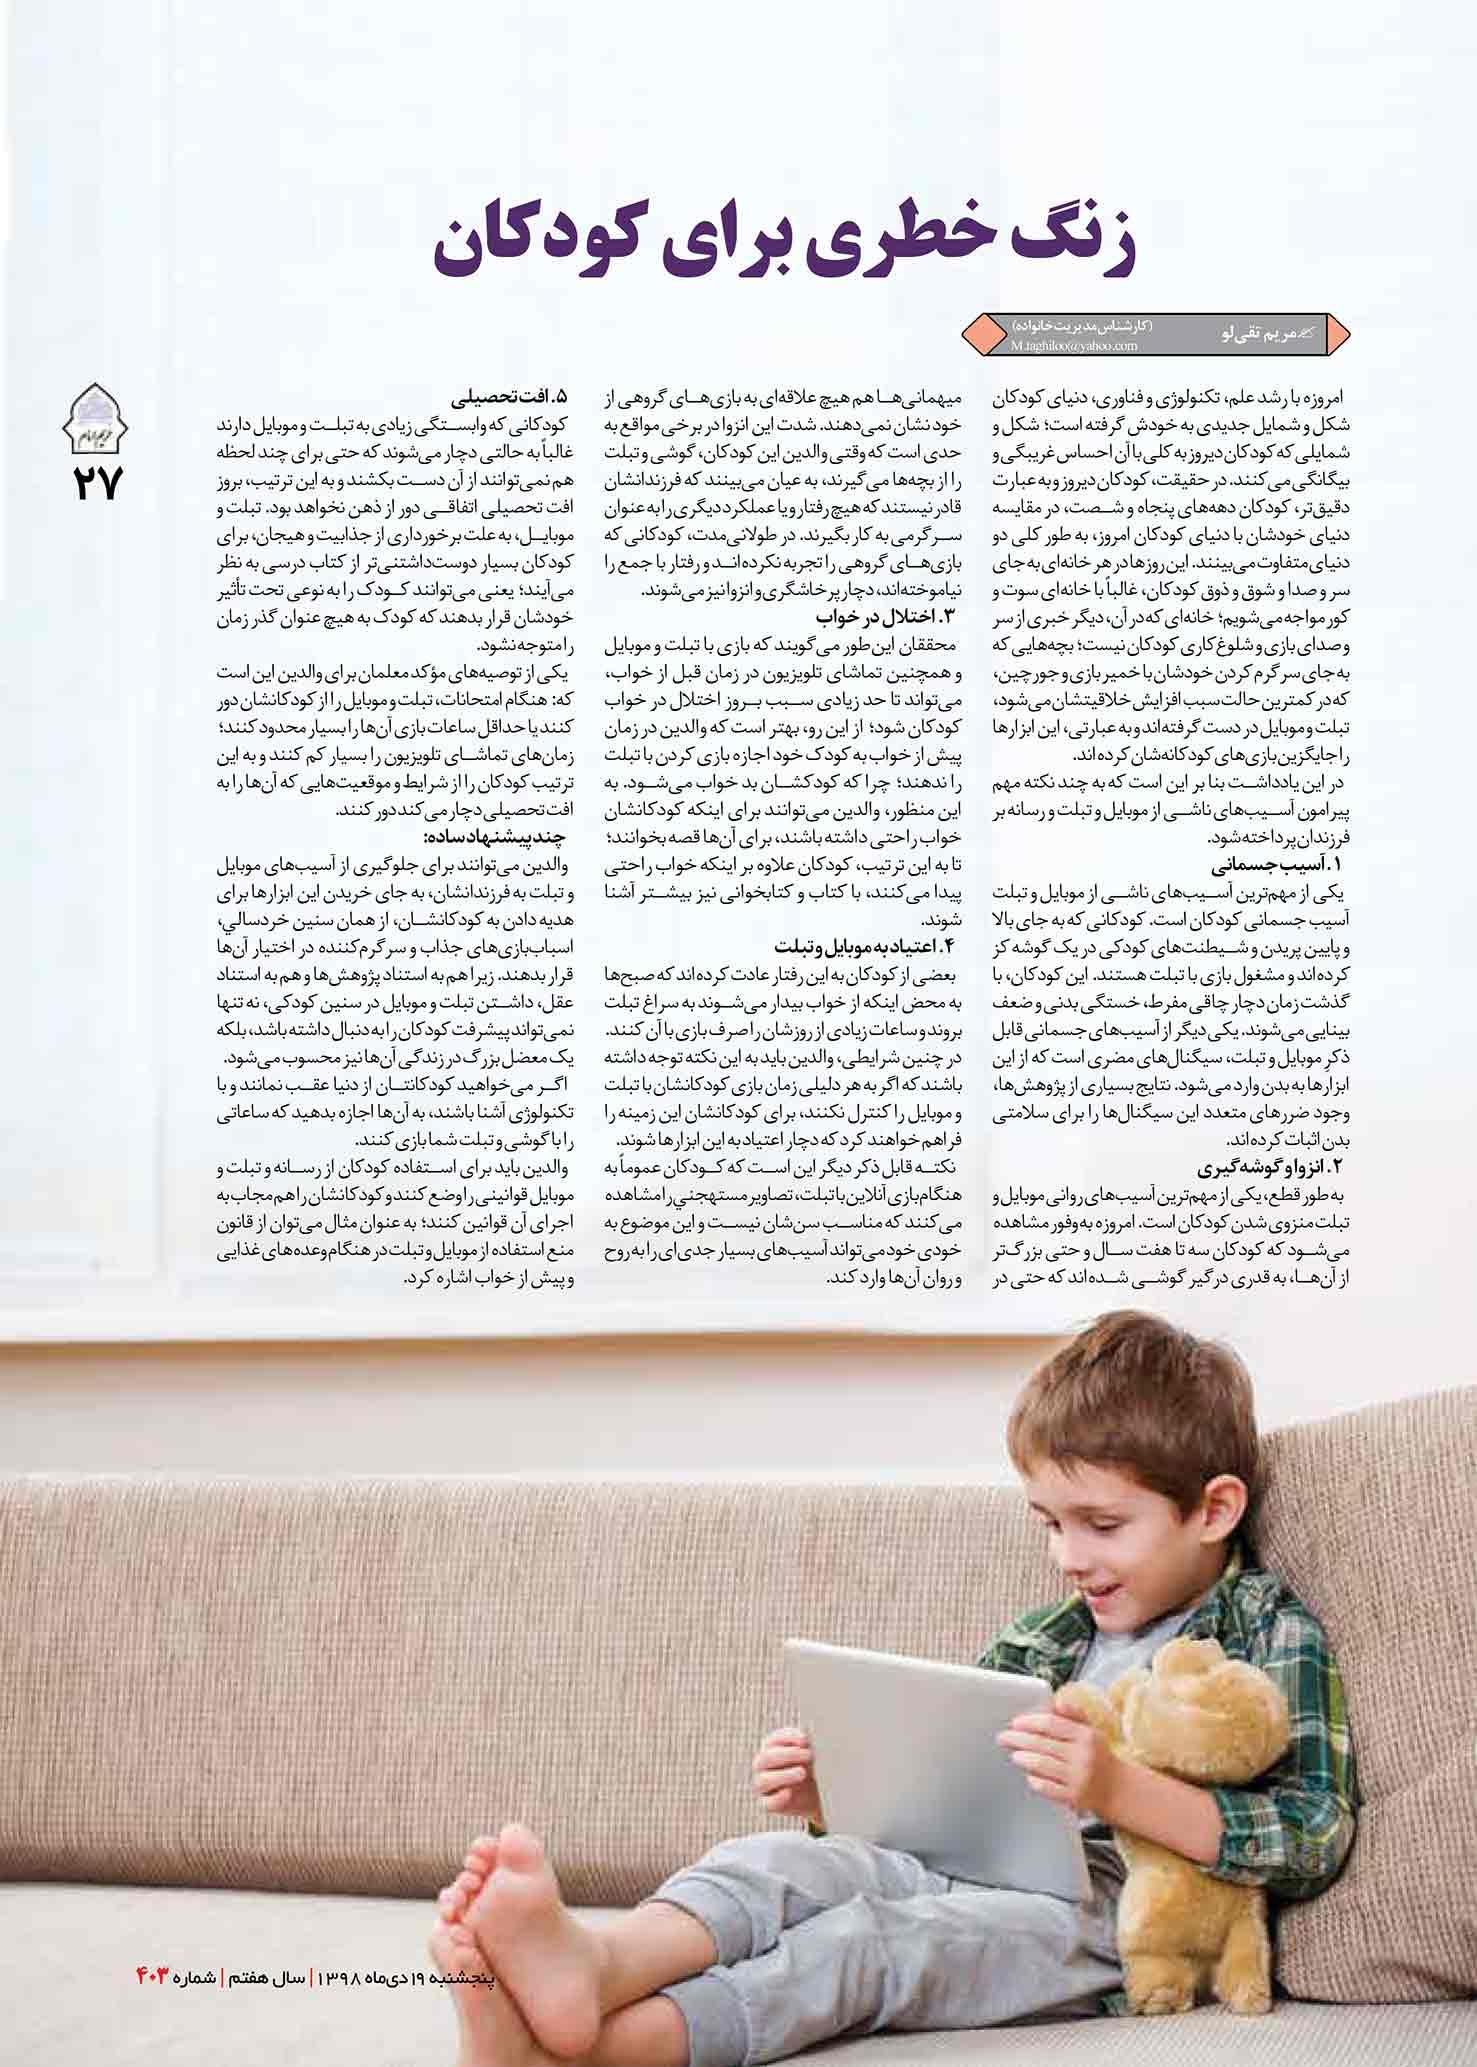 C:\Users\a.khalojini.ICPIKW\Desktop\403\@harim_emam403-27.jpg